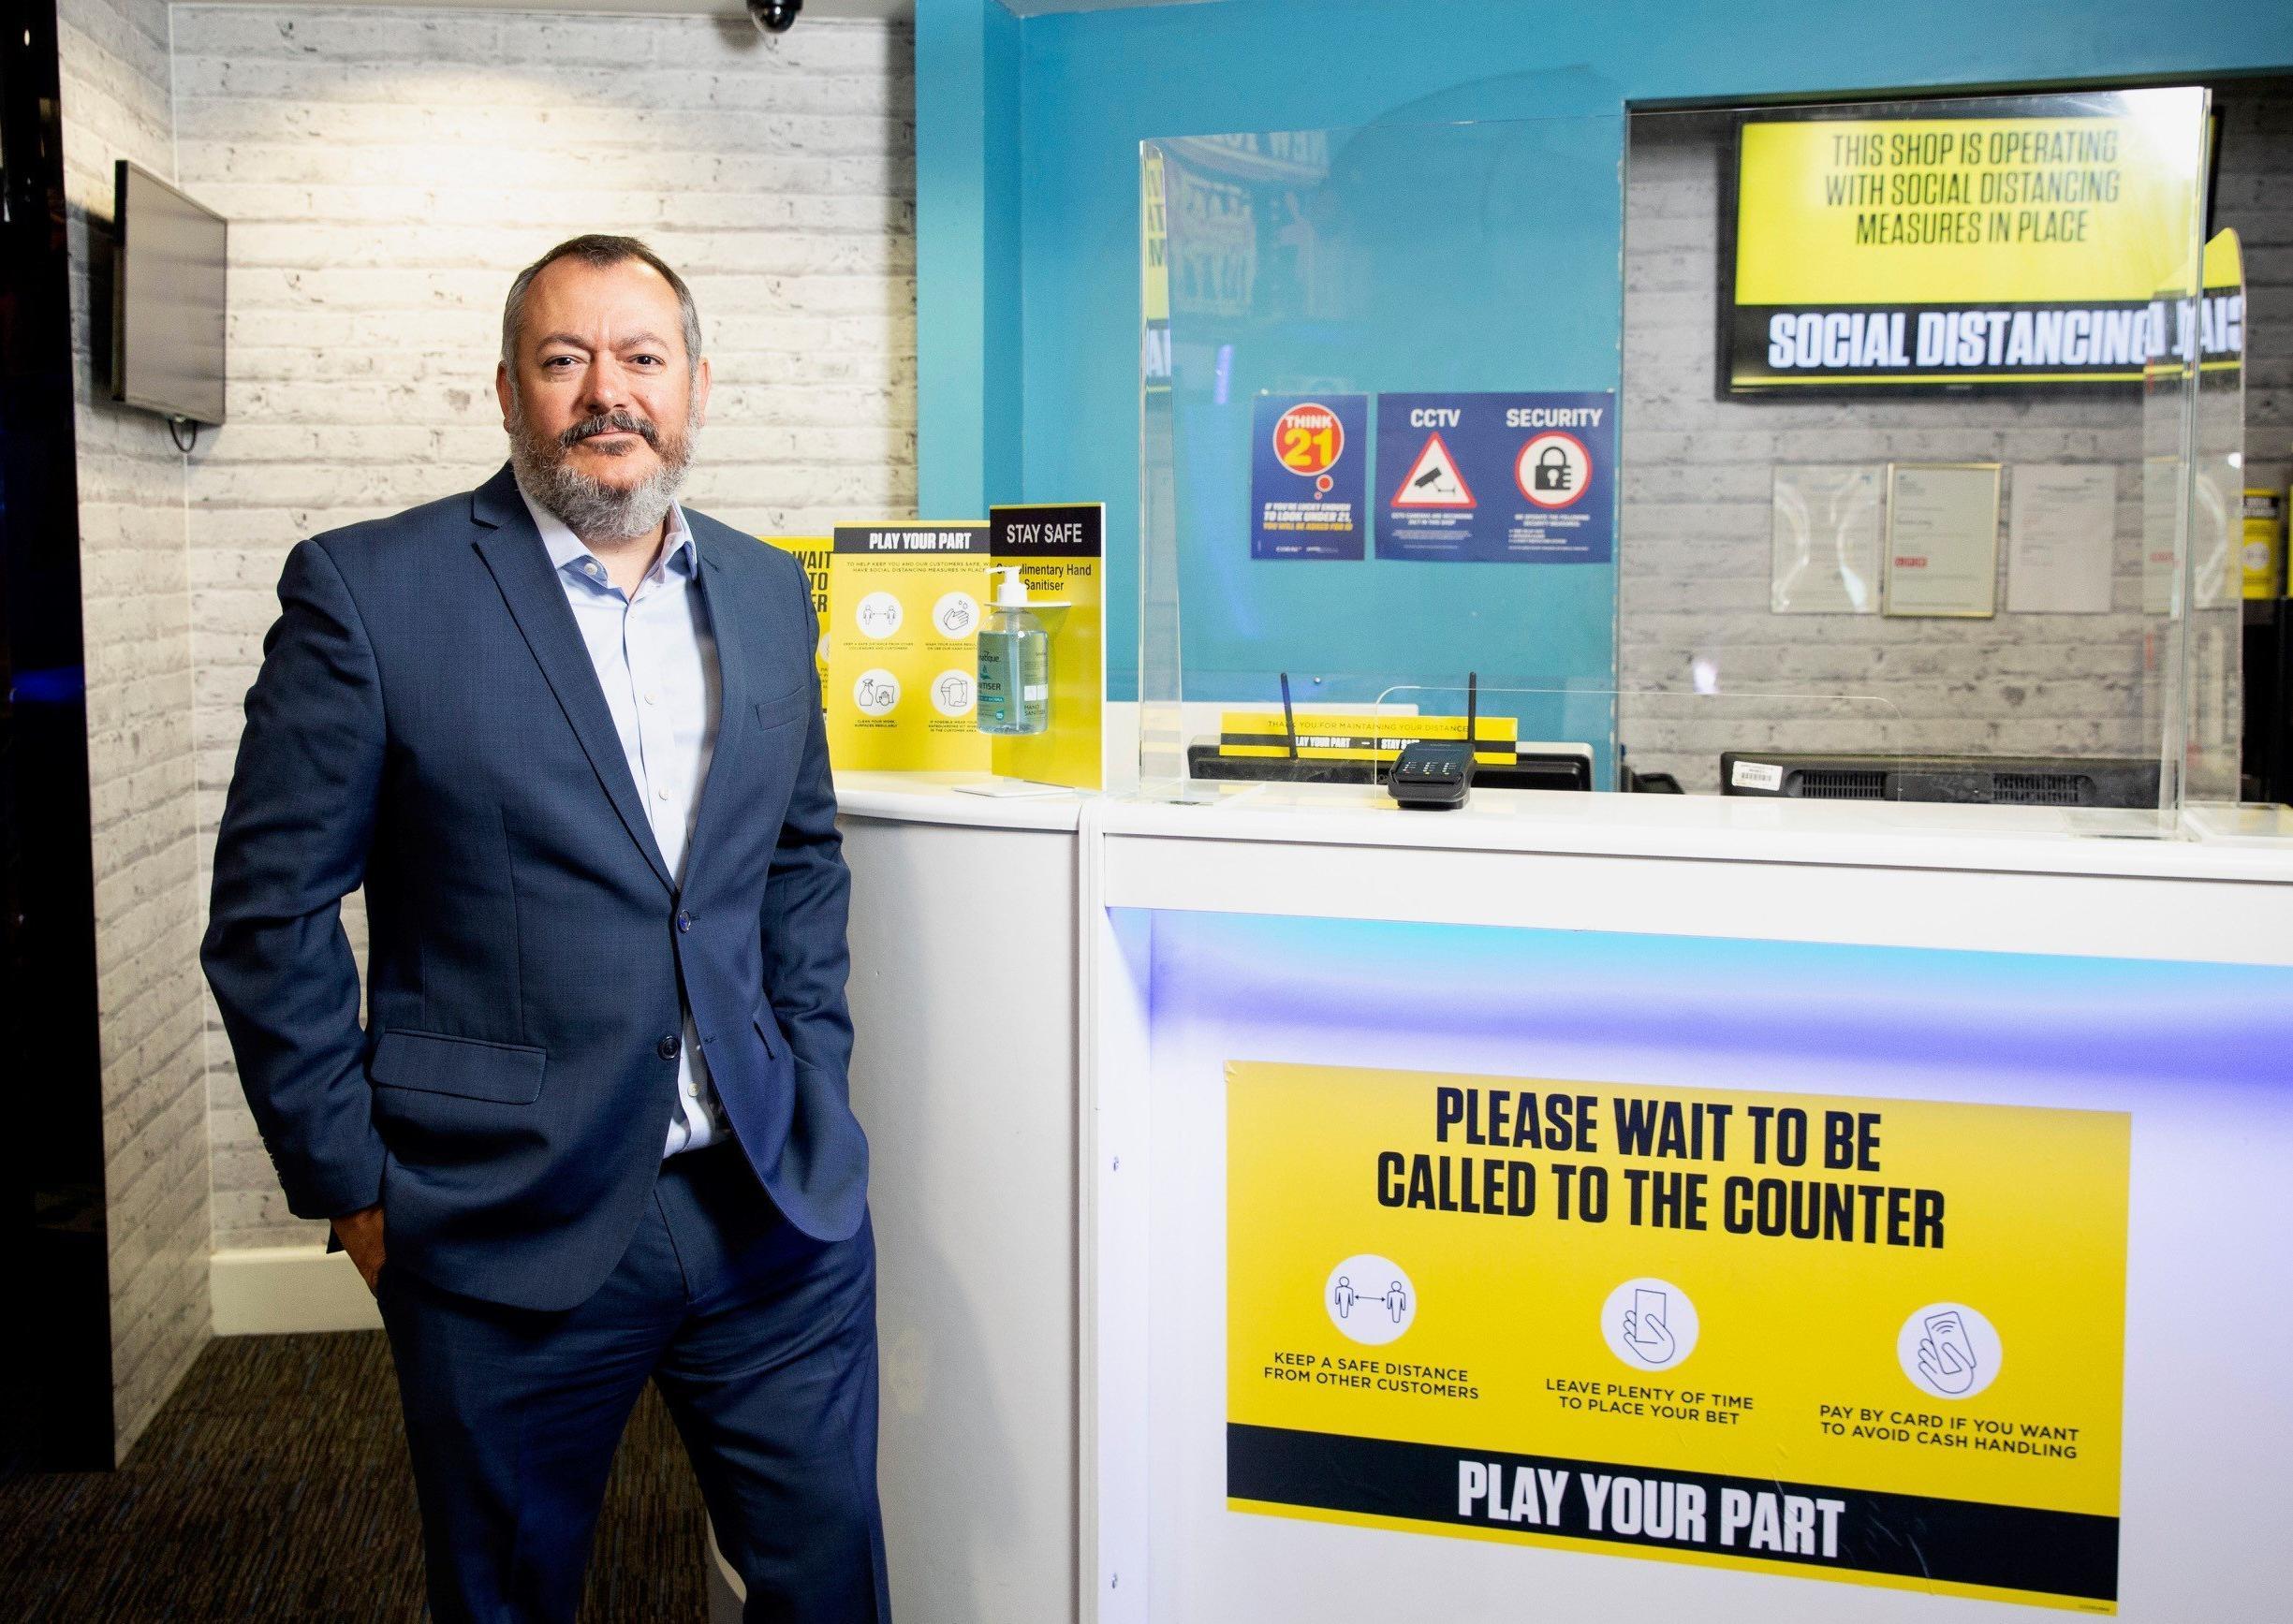 Scottish on course bookmakers betting auburn vs alabama betting line